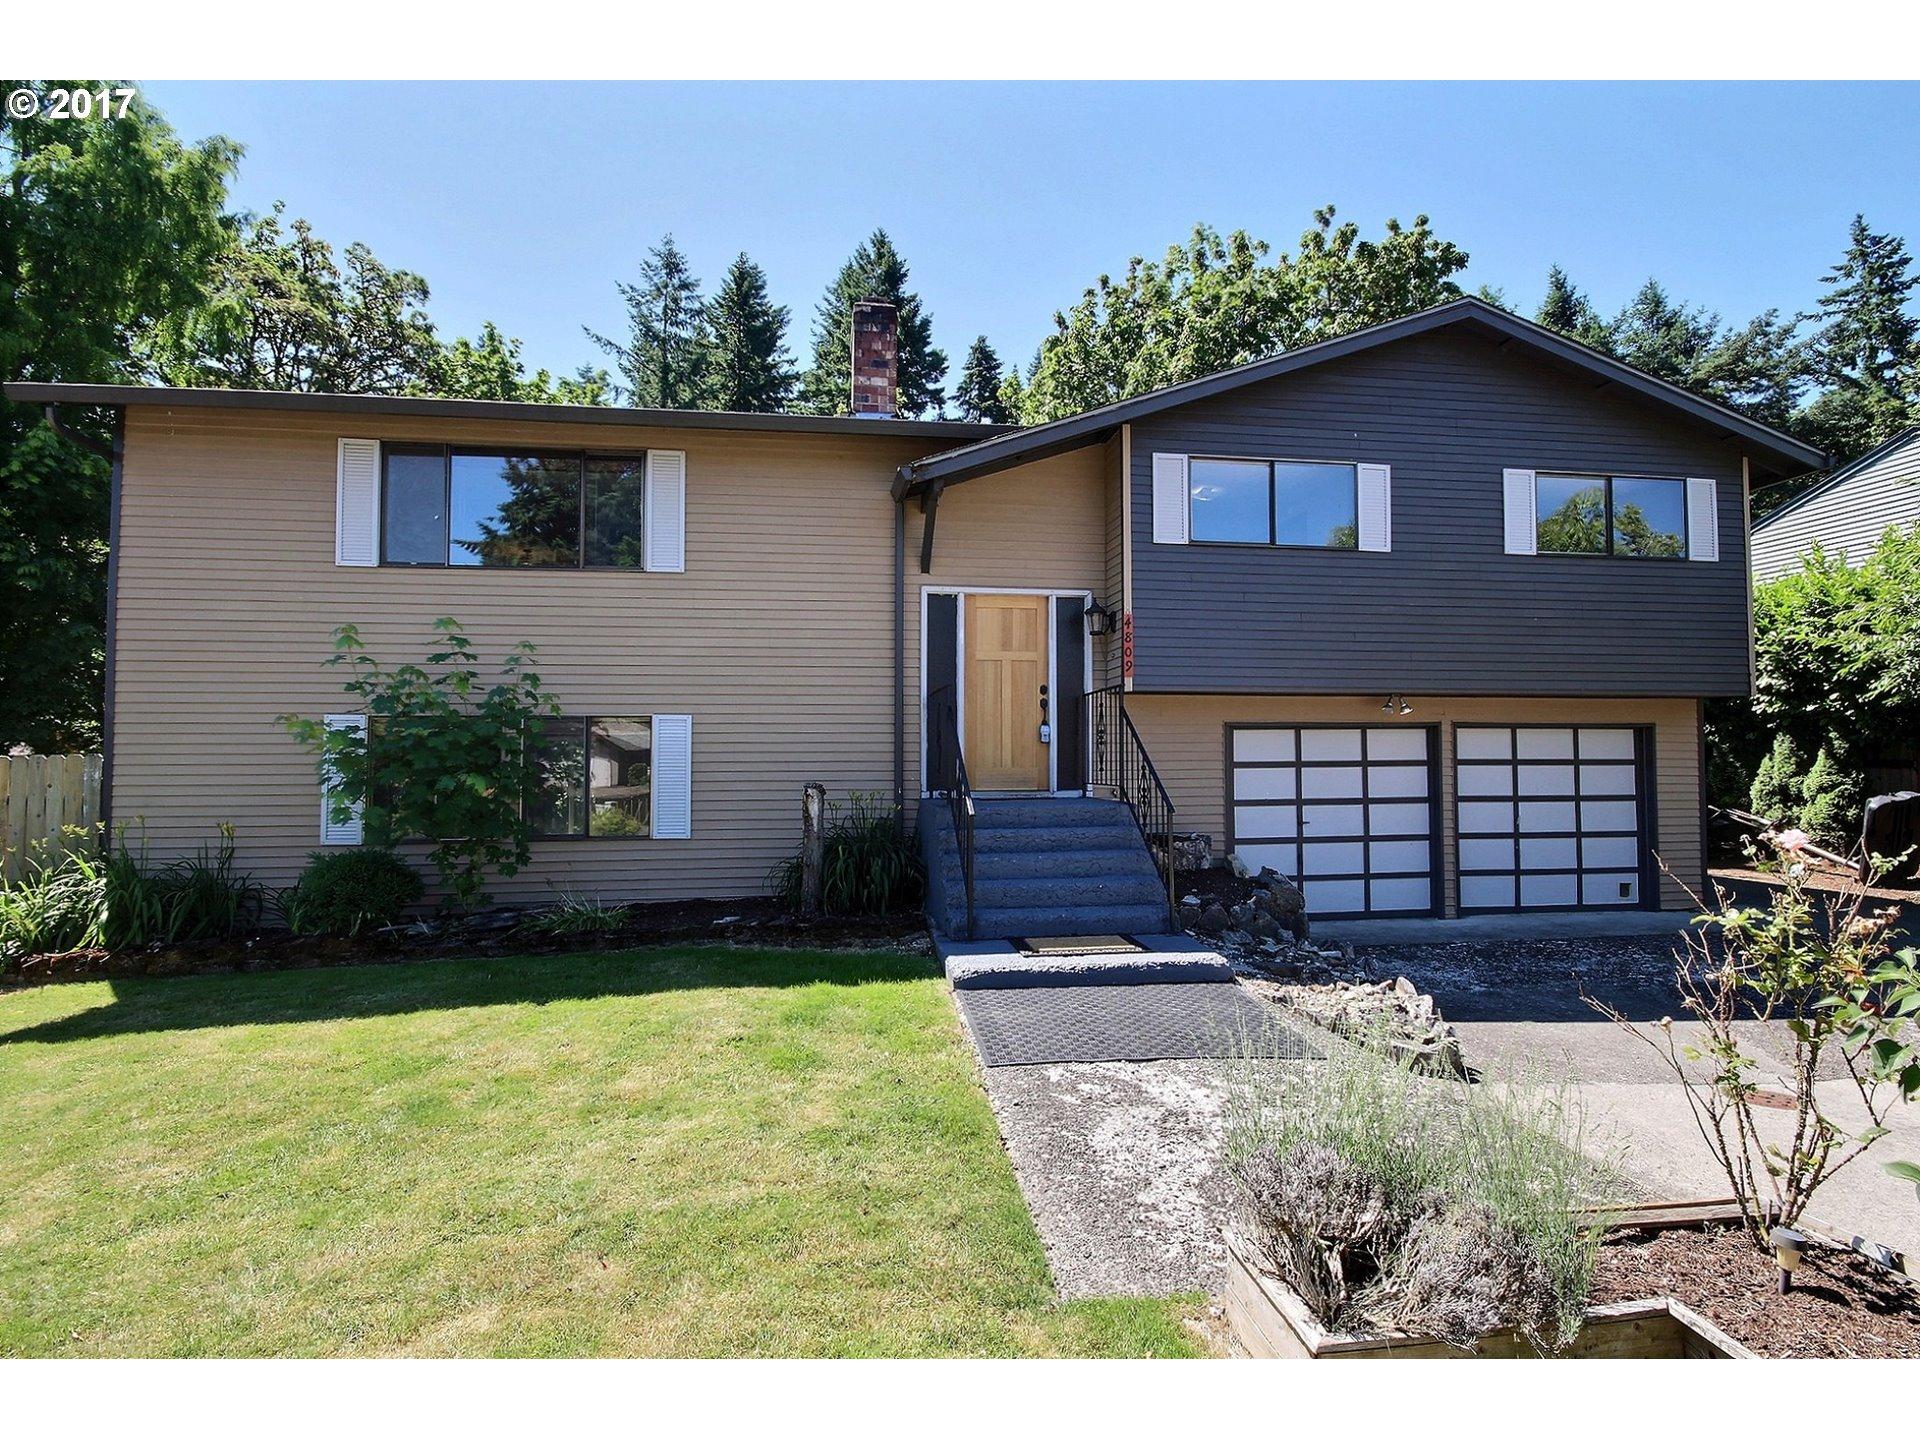 4809 NE 112TH CIR, Vancouver, WA 98686